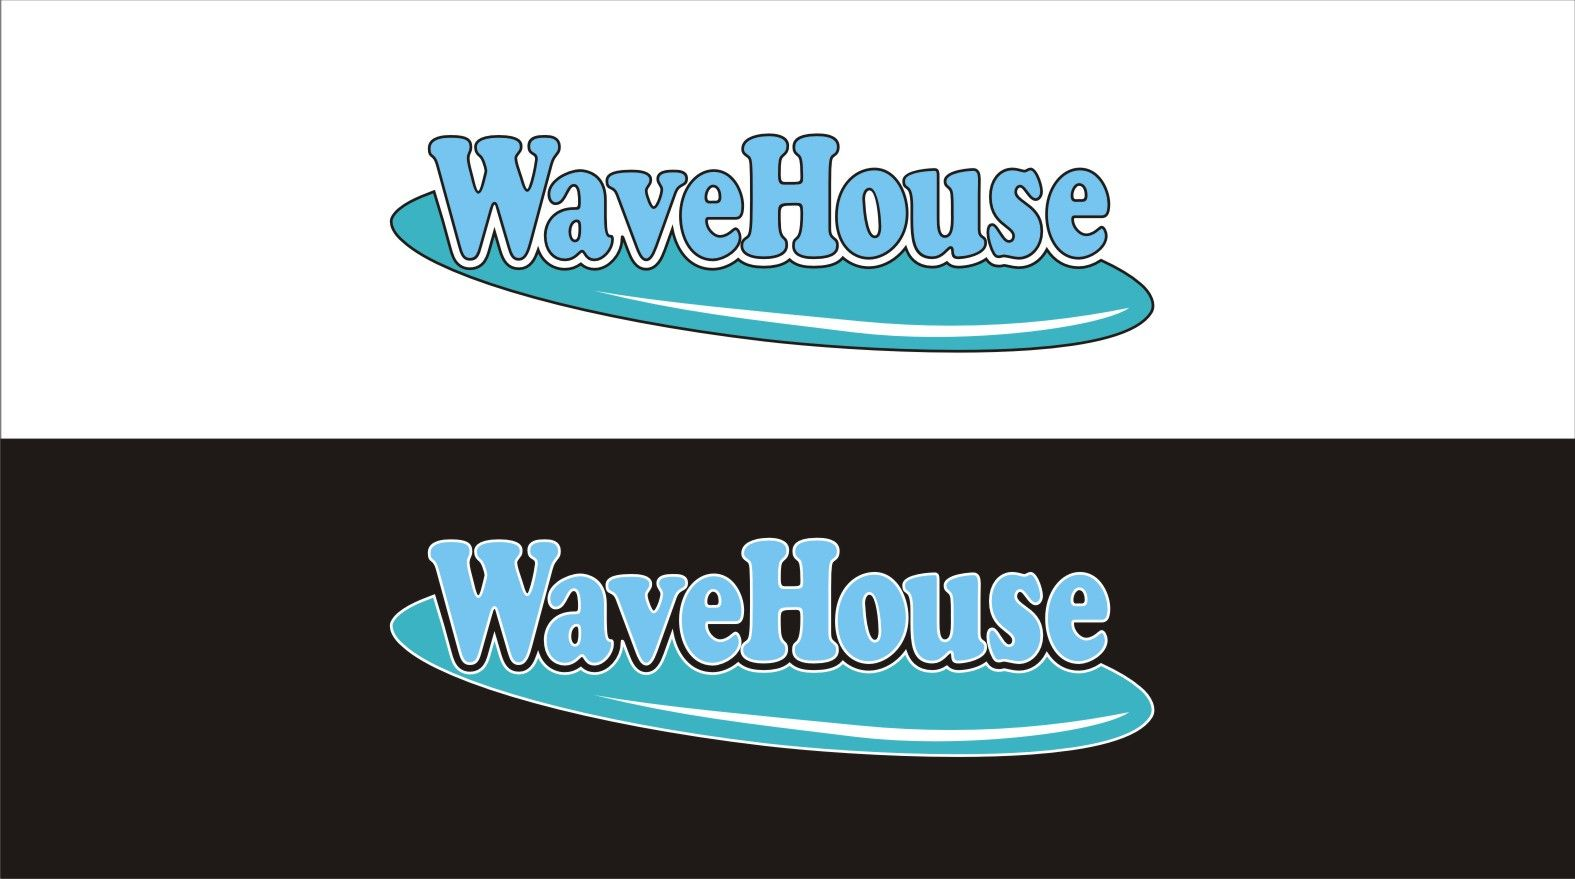 Редизайн логотипа для серф-кэмпа на Бали - дизайнер Evgenia_021